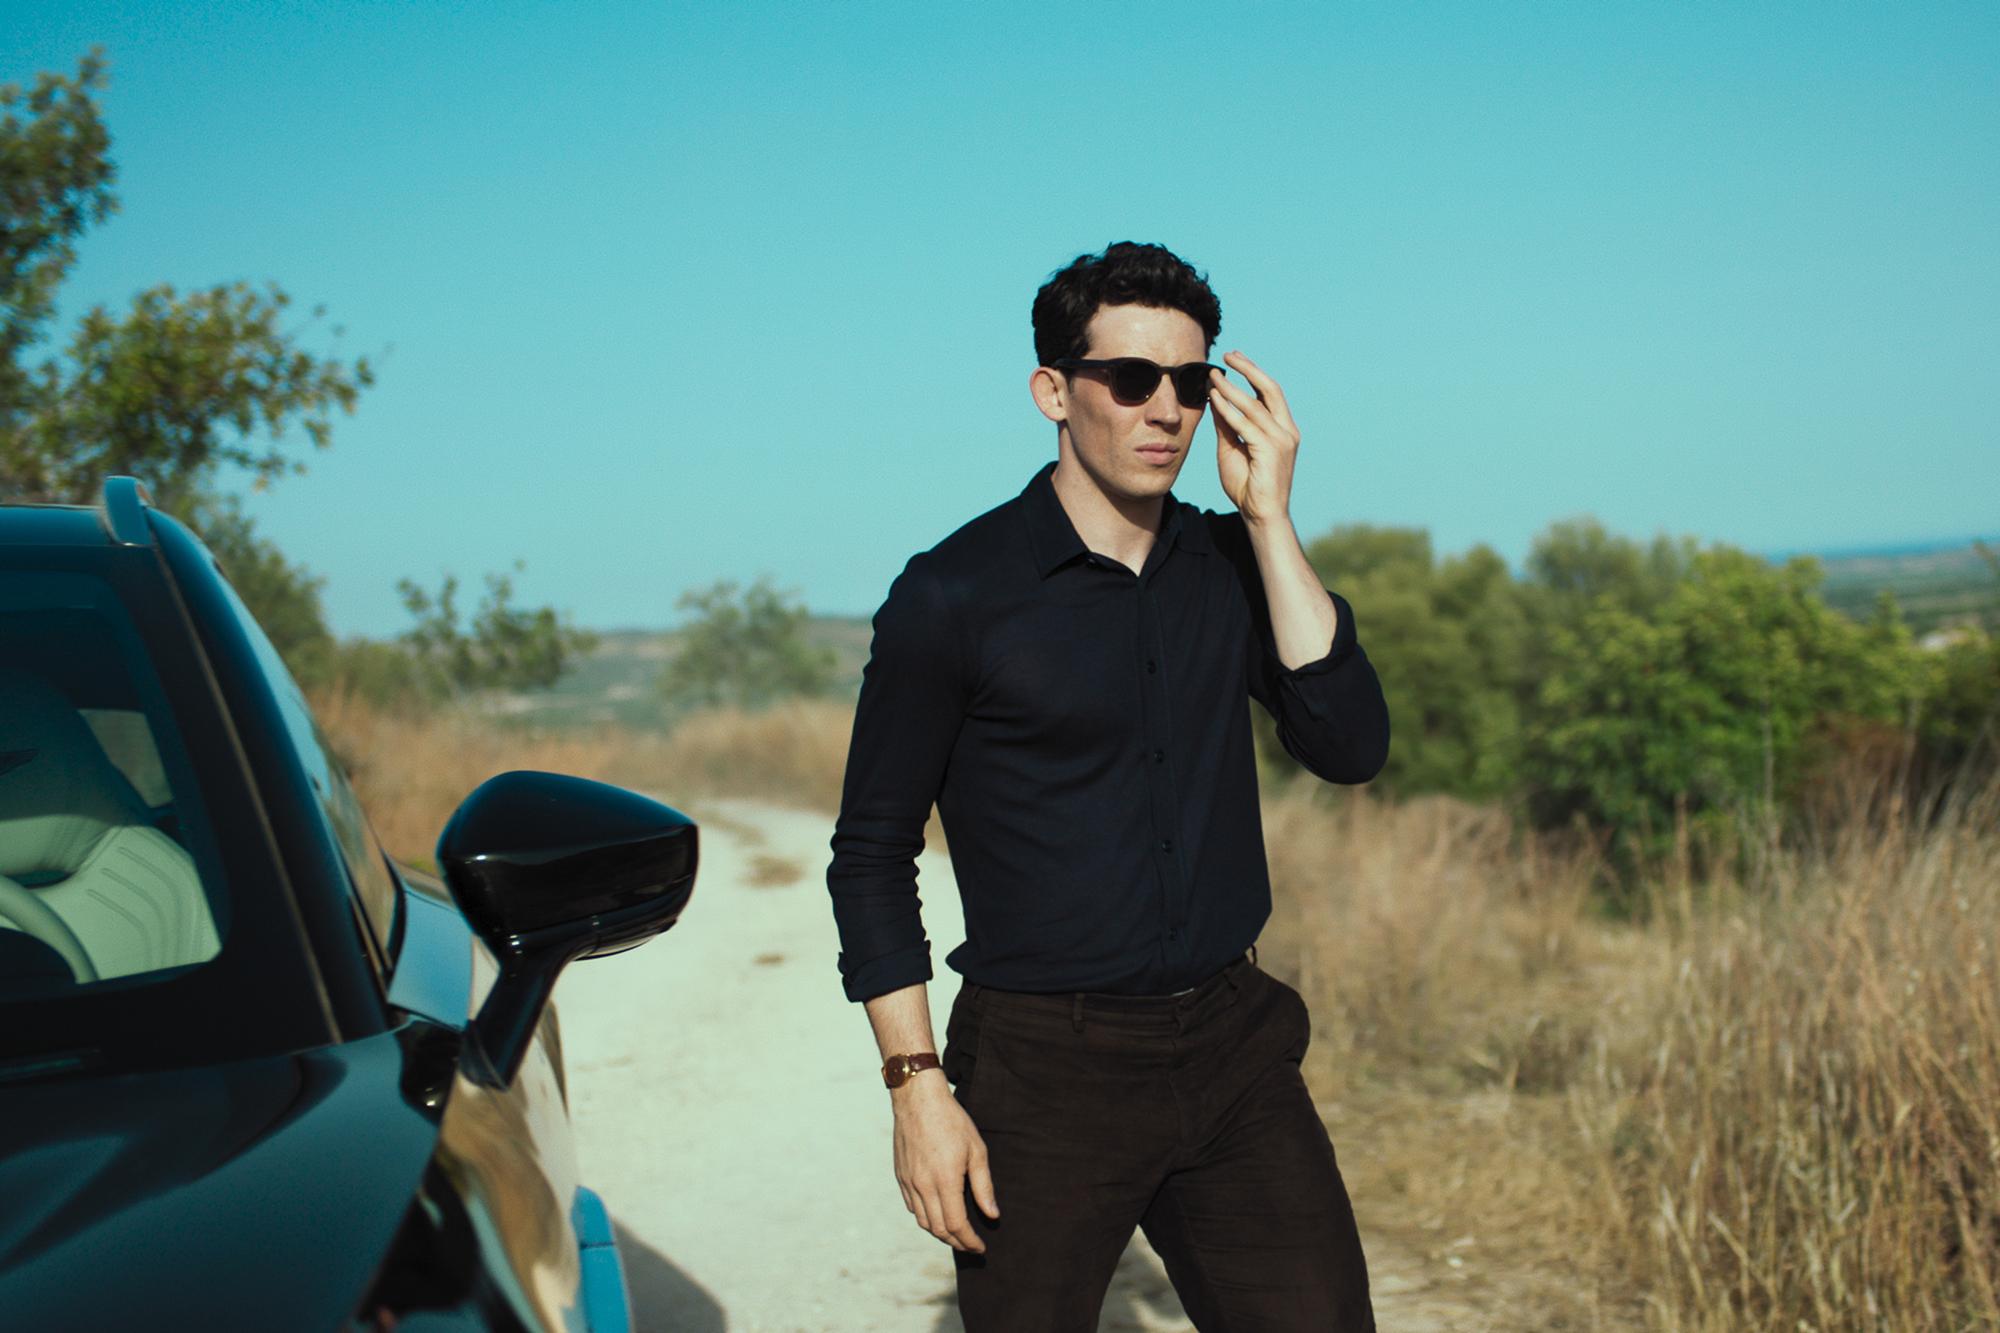 Josh O'Connor stars in the new Luca Guadagnino-directed film to launch the Aston Martin DBX